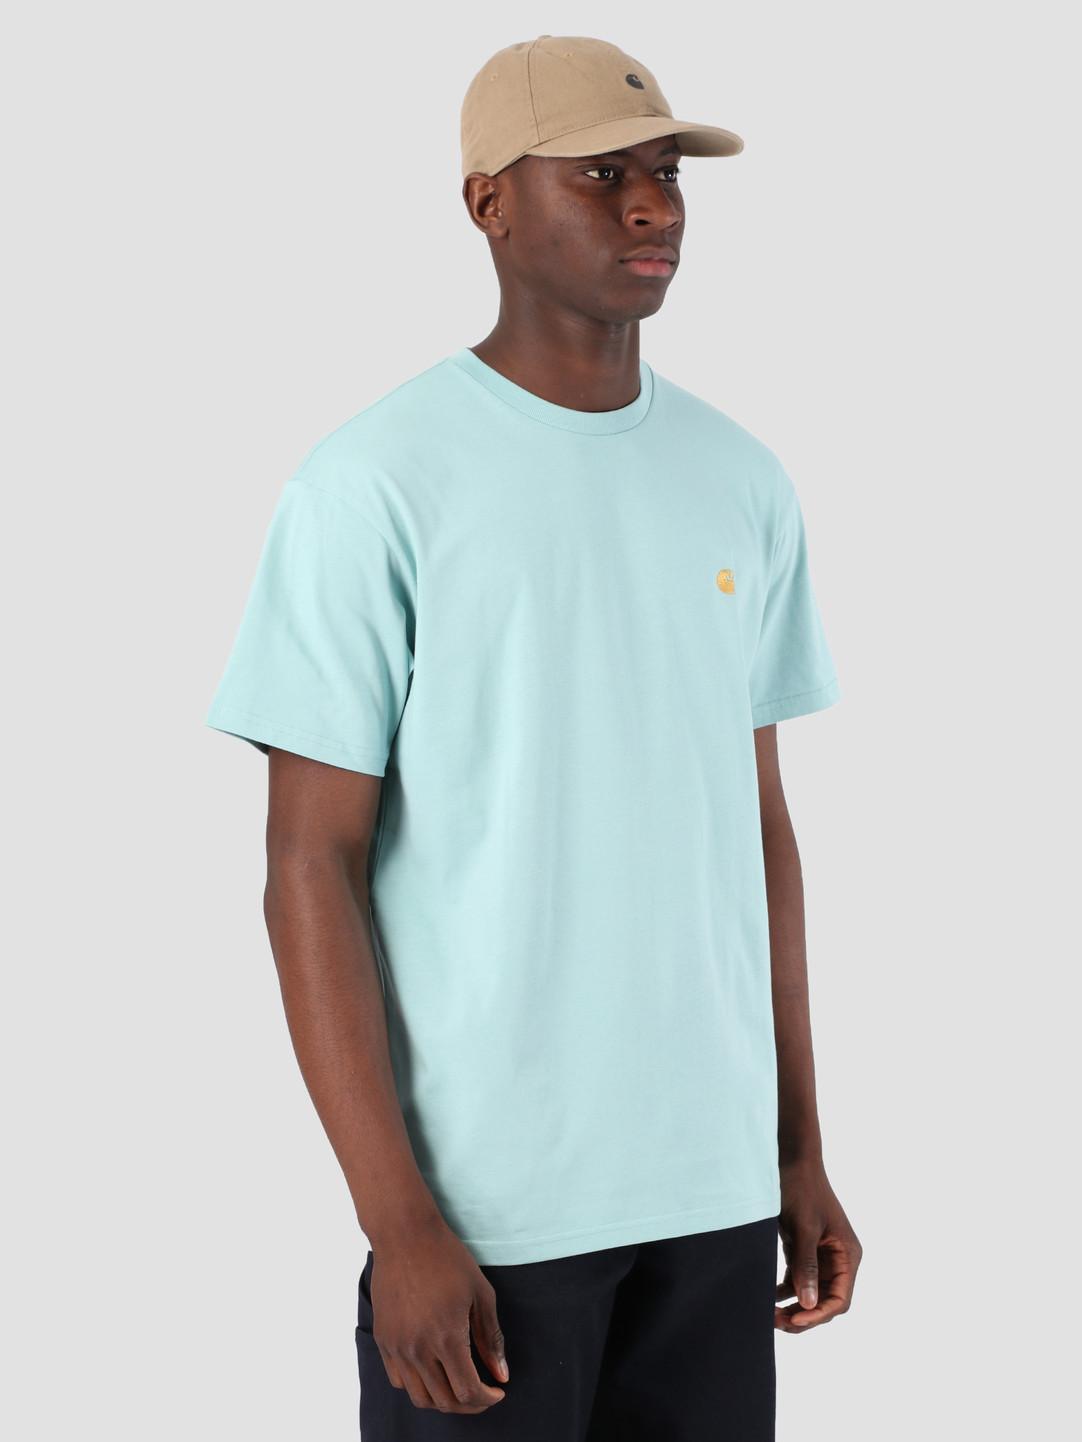 Carhartt WIP Carhartt WIP Short Sleeve Chase T-Shirt Soft Aloe Gold 61091000